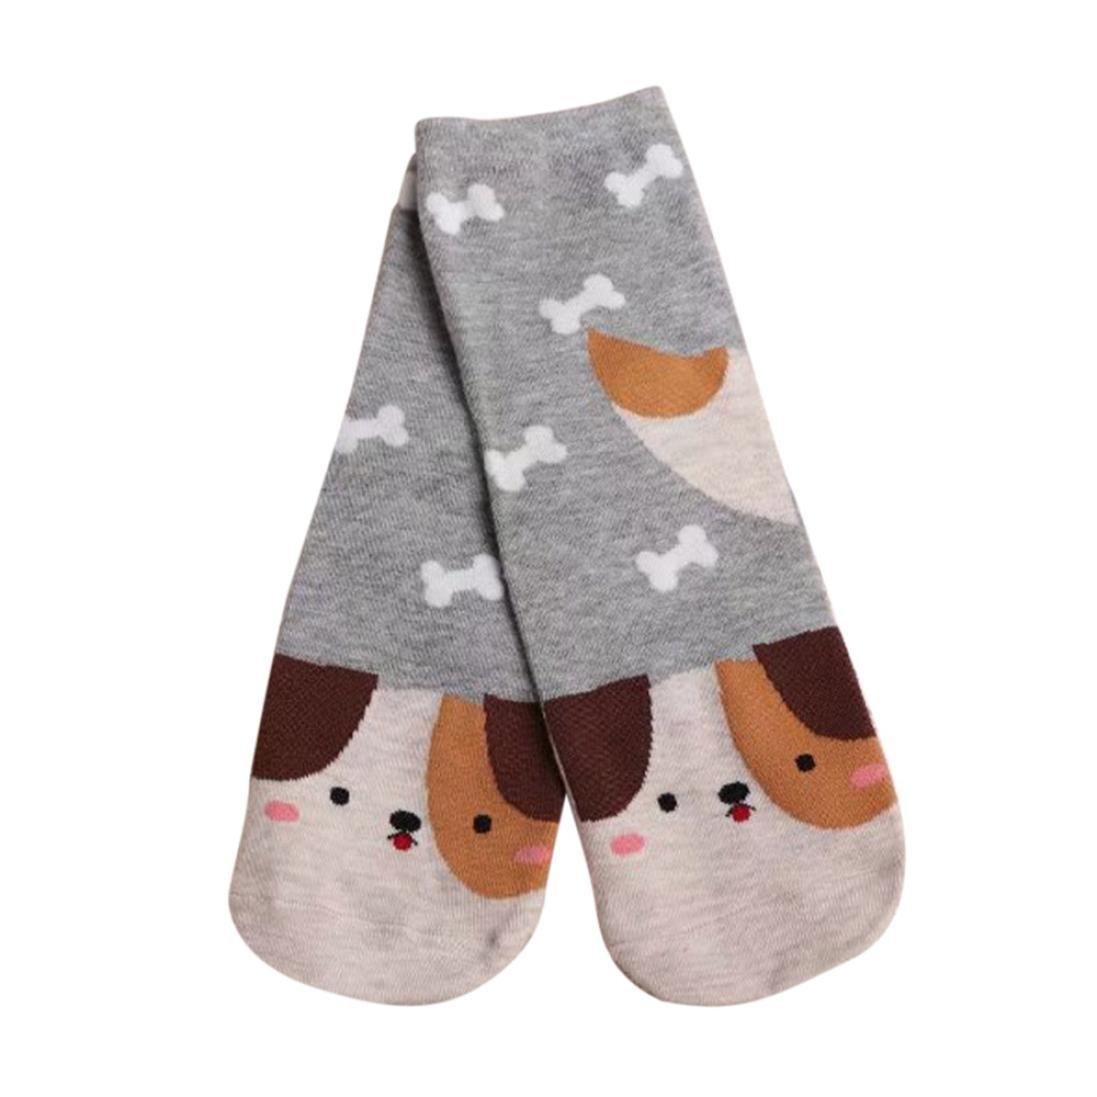 Clearance!Women Socks Ladies Girls Cotton Warm Soft Sox Cute Cartoon Socks (Gray)